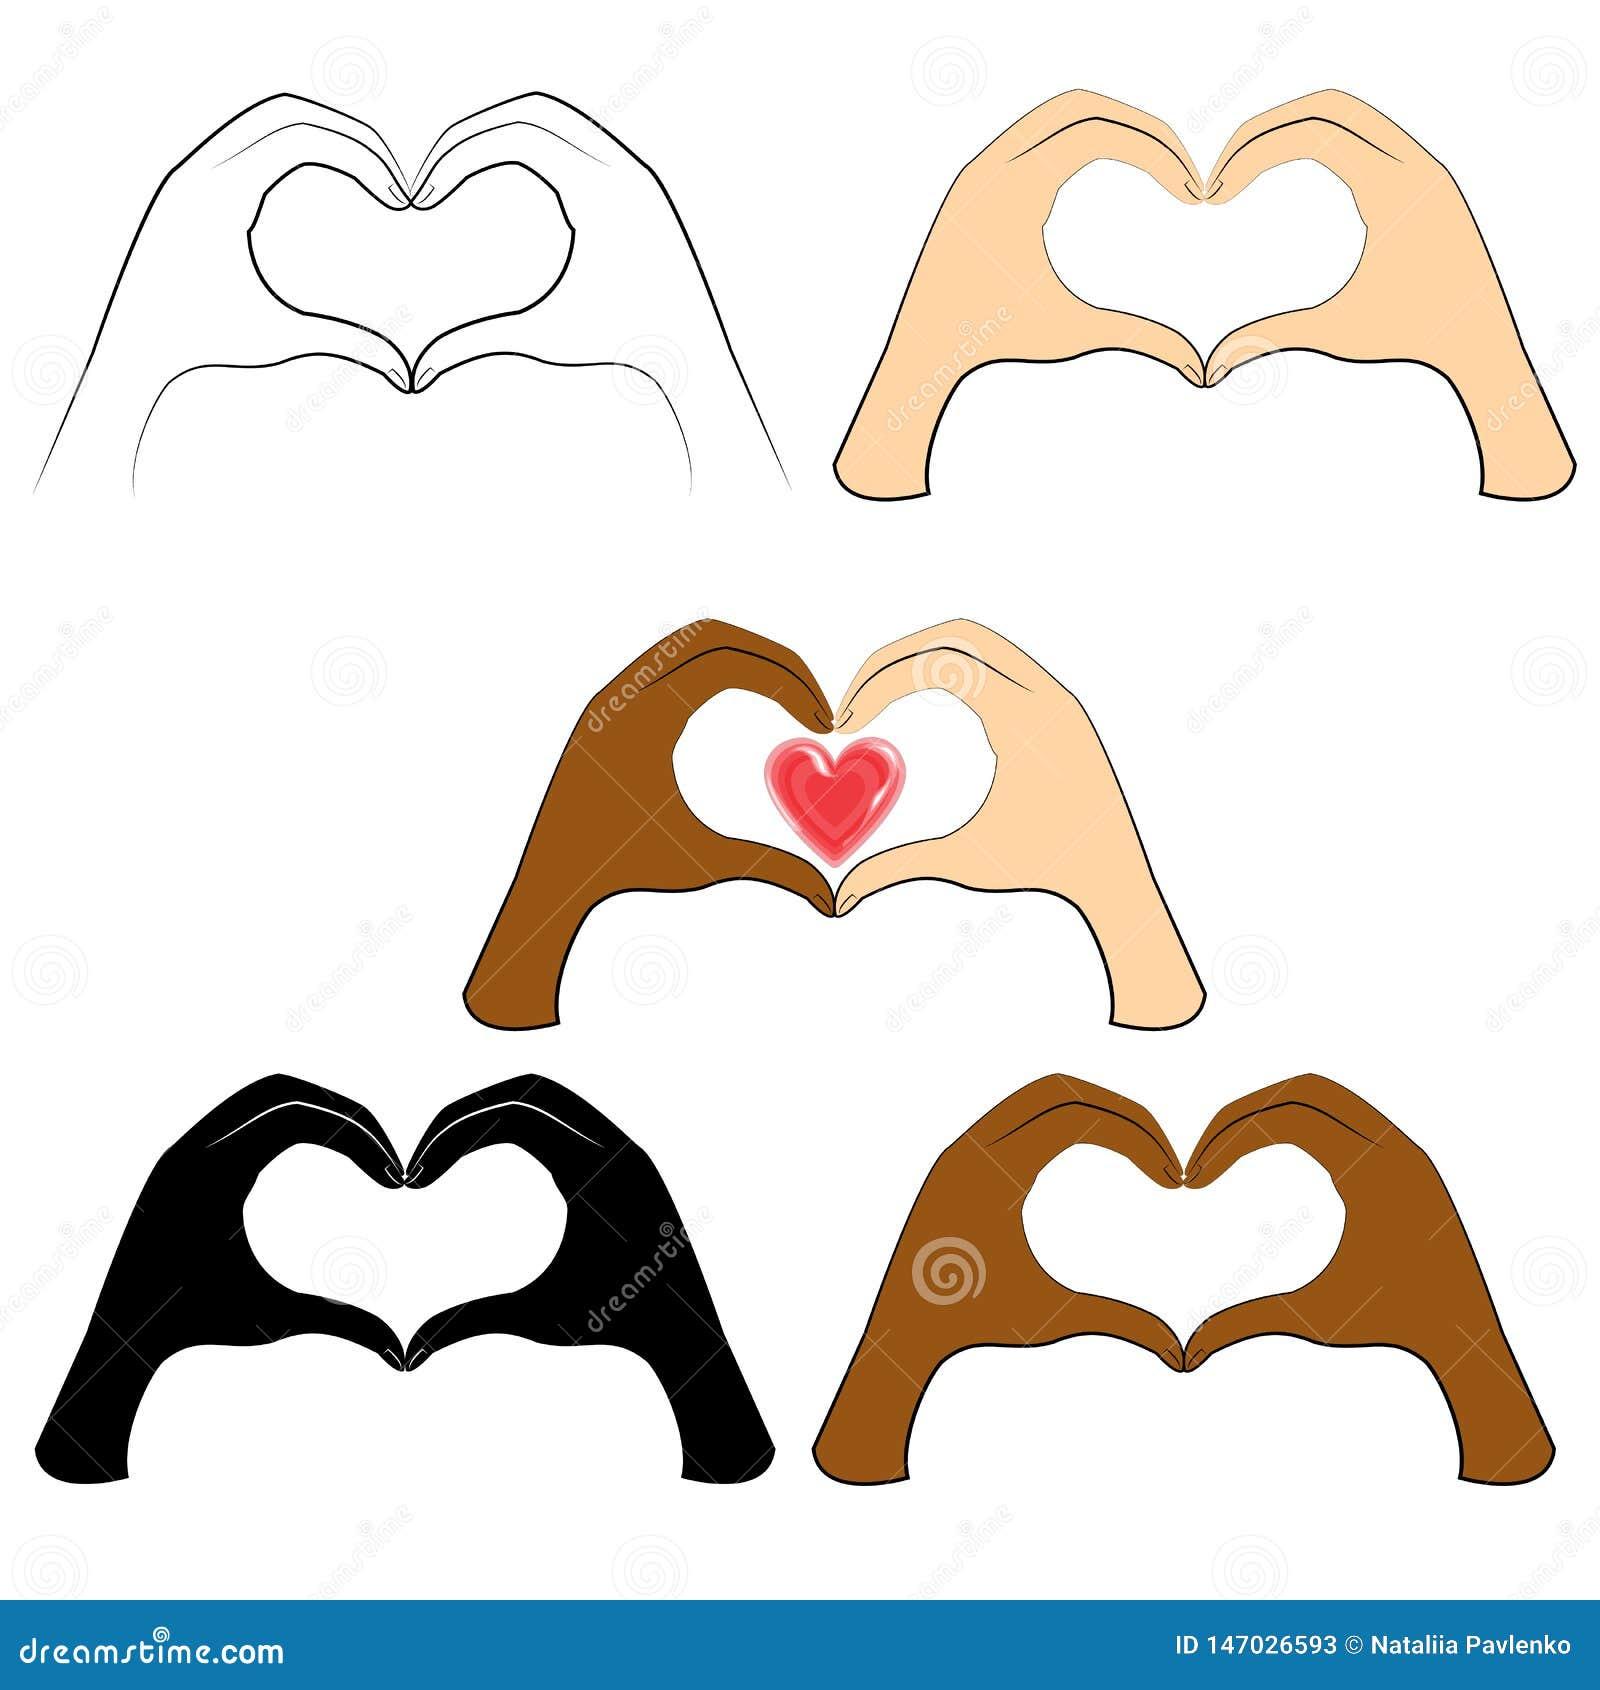 R Τα ανθρώπινα χέρια είναι διπλωμένα με μορφή μιας καρδιάς και μιας κόκκινης καρδιάς Άνθρωποι των διαφορετικών υπηκοοτήτων Ημέρα